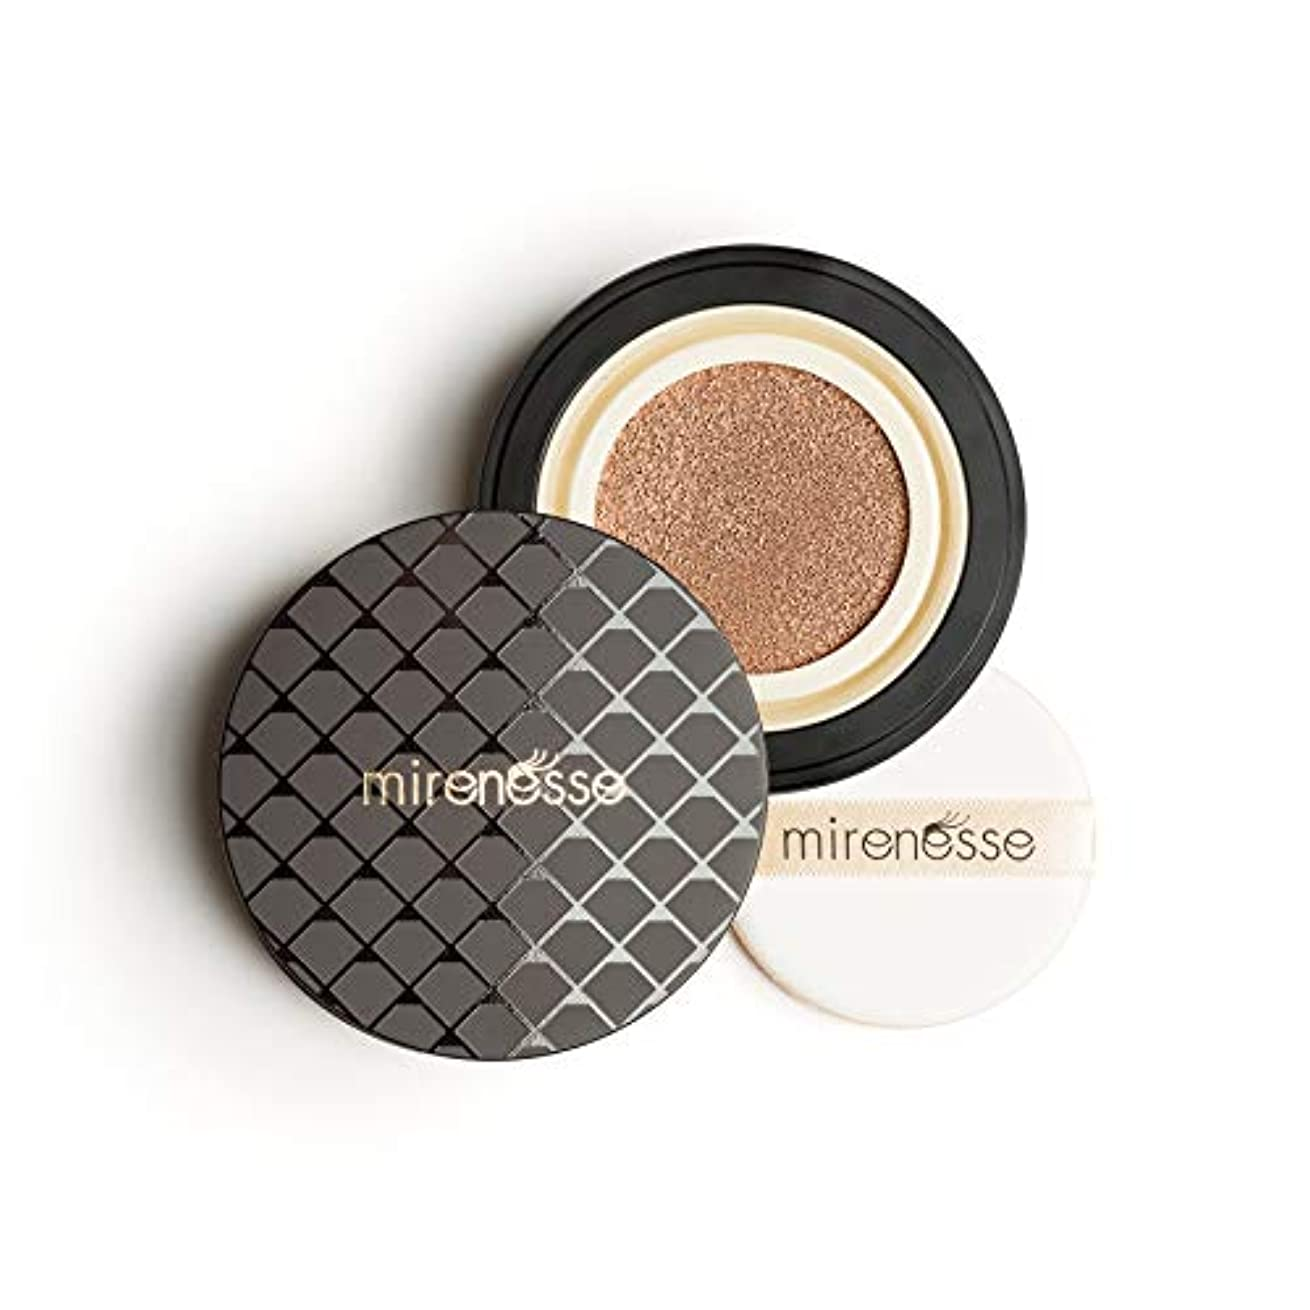 Mirenesse Cosmetics 10 Collagen Cushion Foundation Compact Airbrush Liquid Powder SPF25 PA++ 15g/0.52oz - Shade...